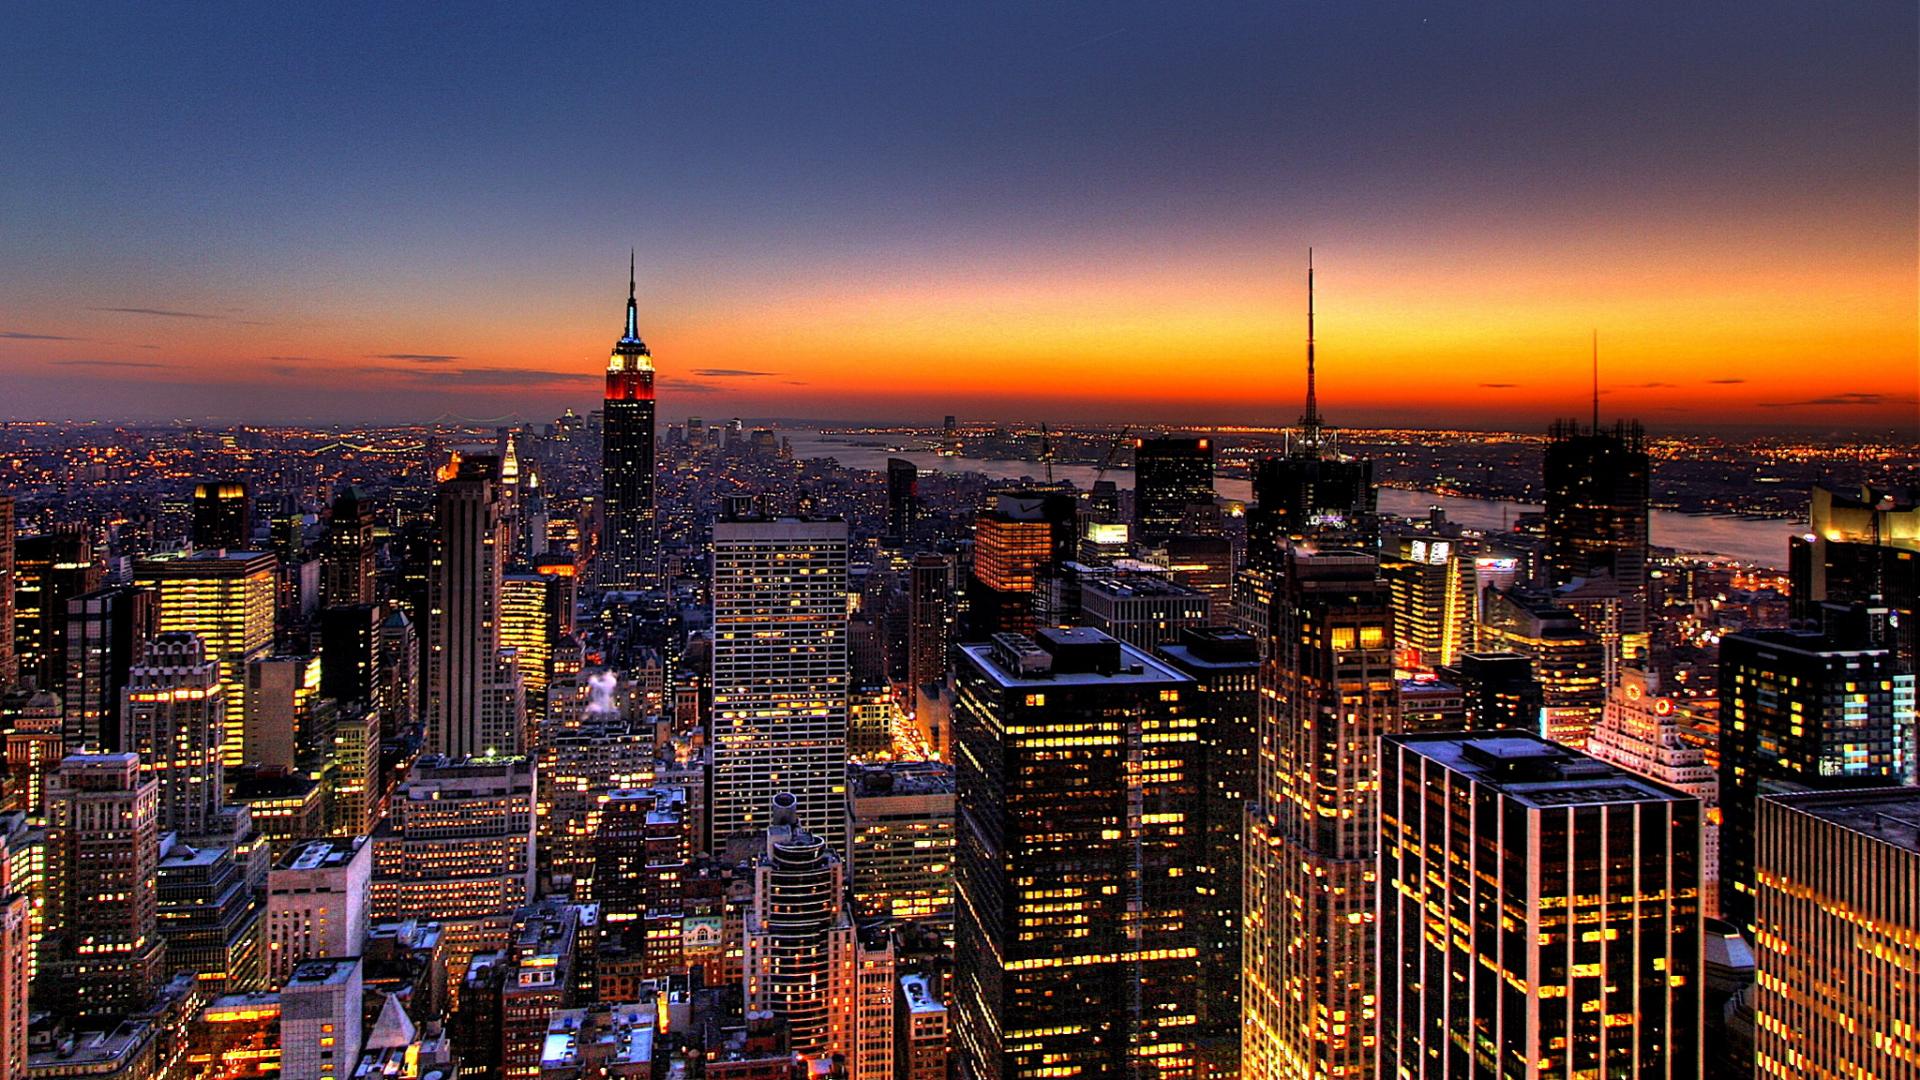 Free Download City Beautiful Night Hd Wallpaper New York City